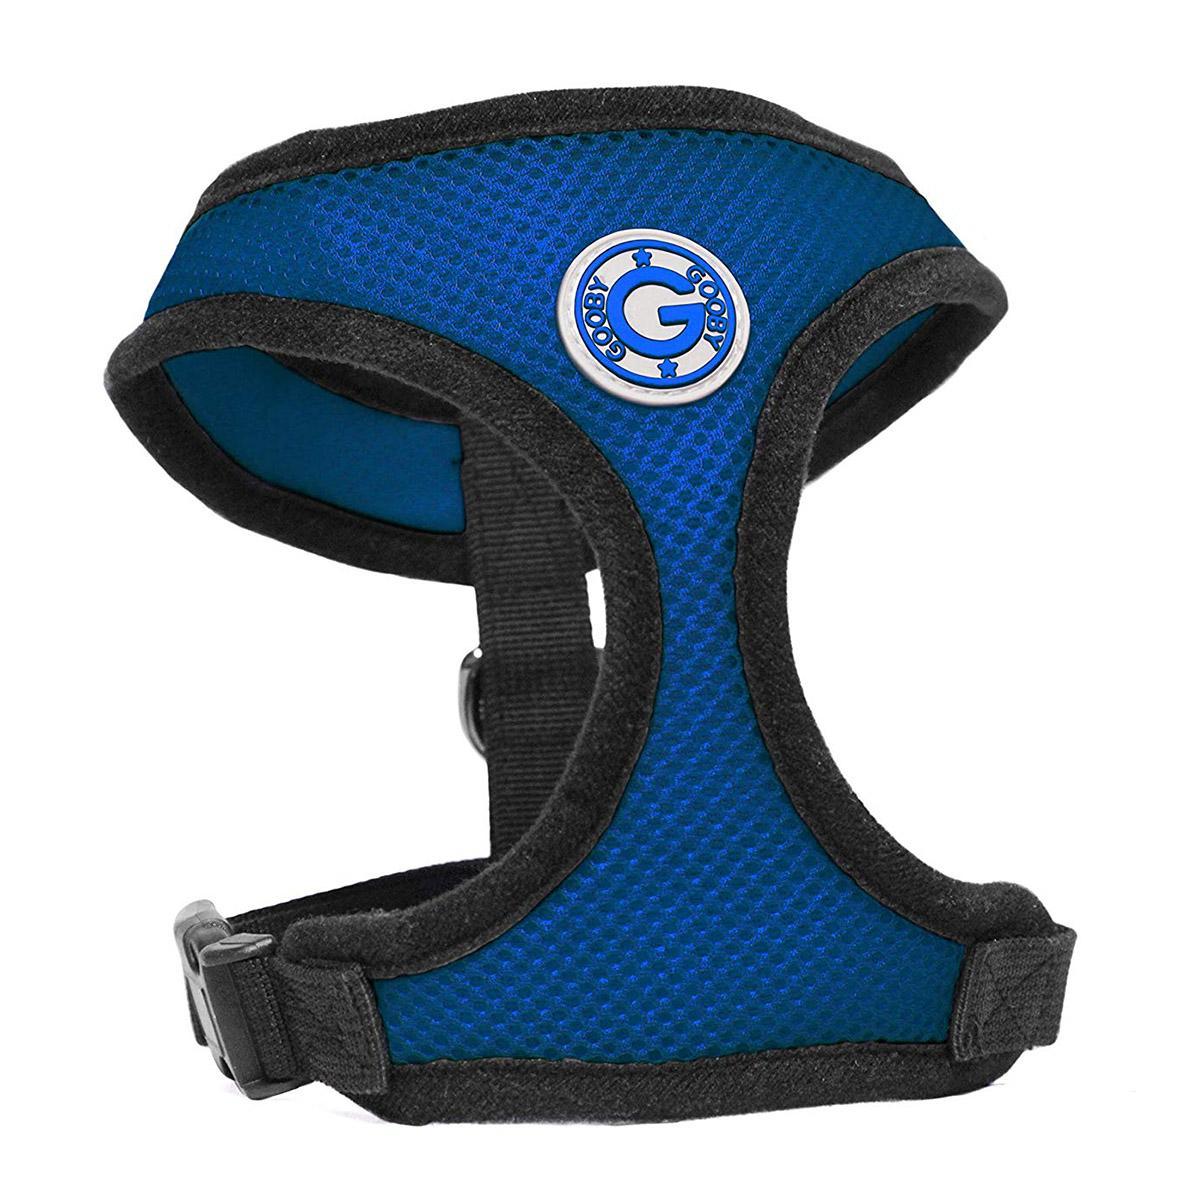 Gooby Soft Mesh Dog Harness - Blue